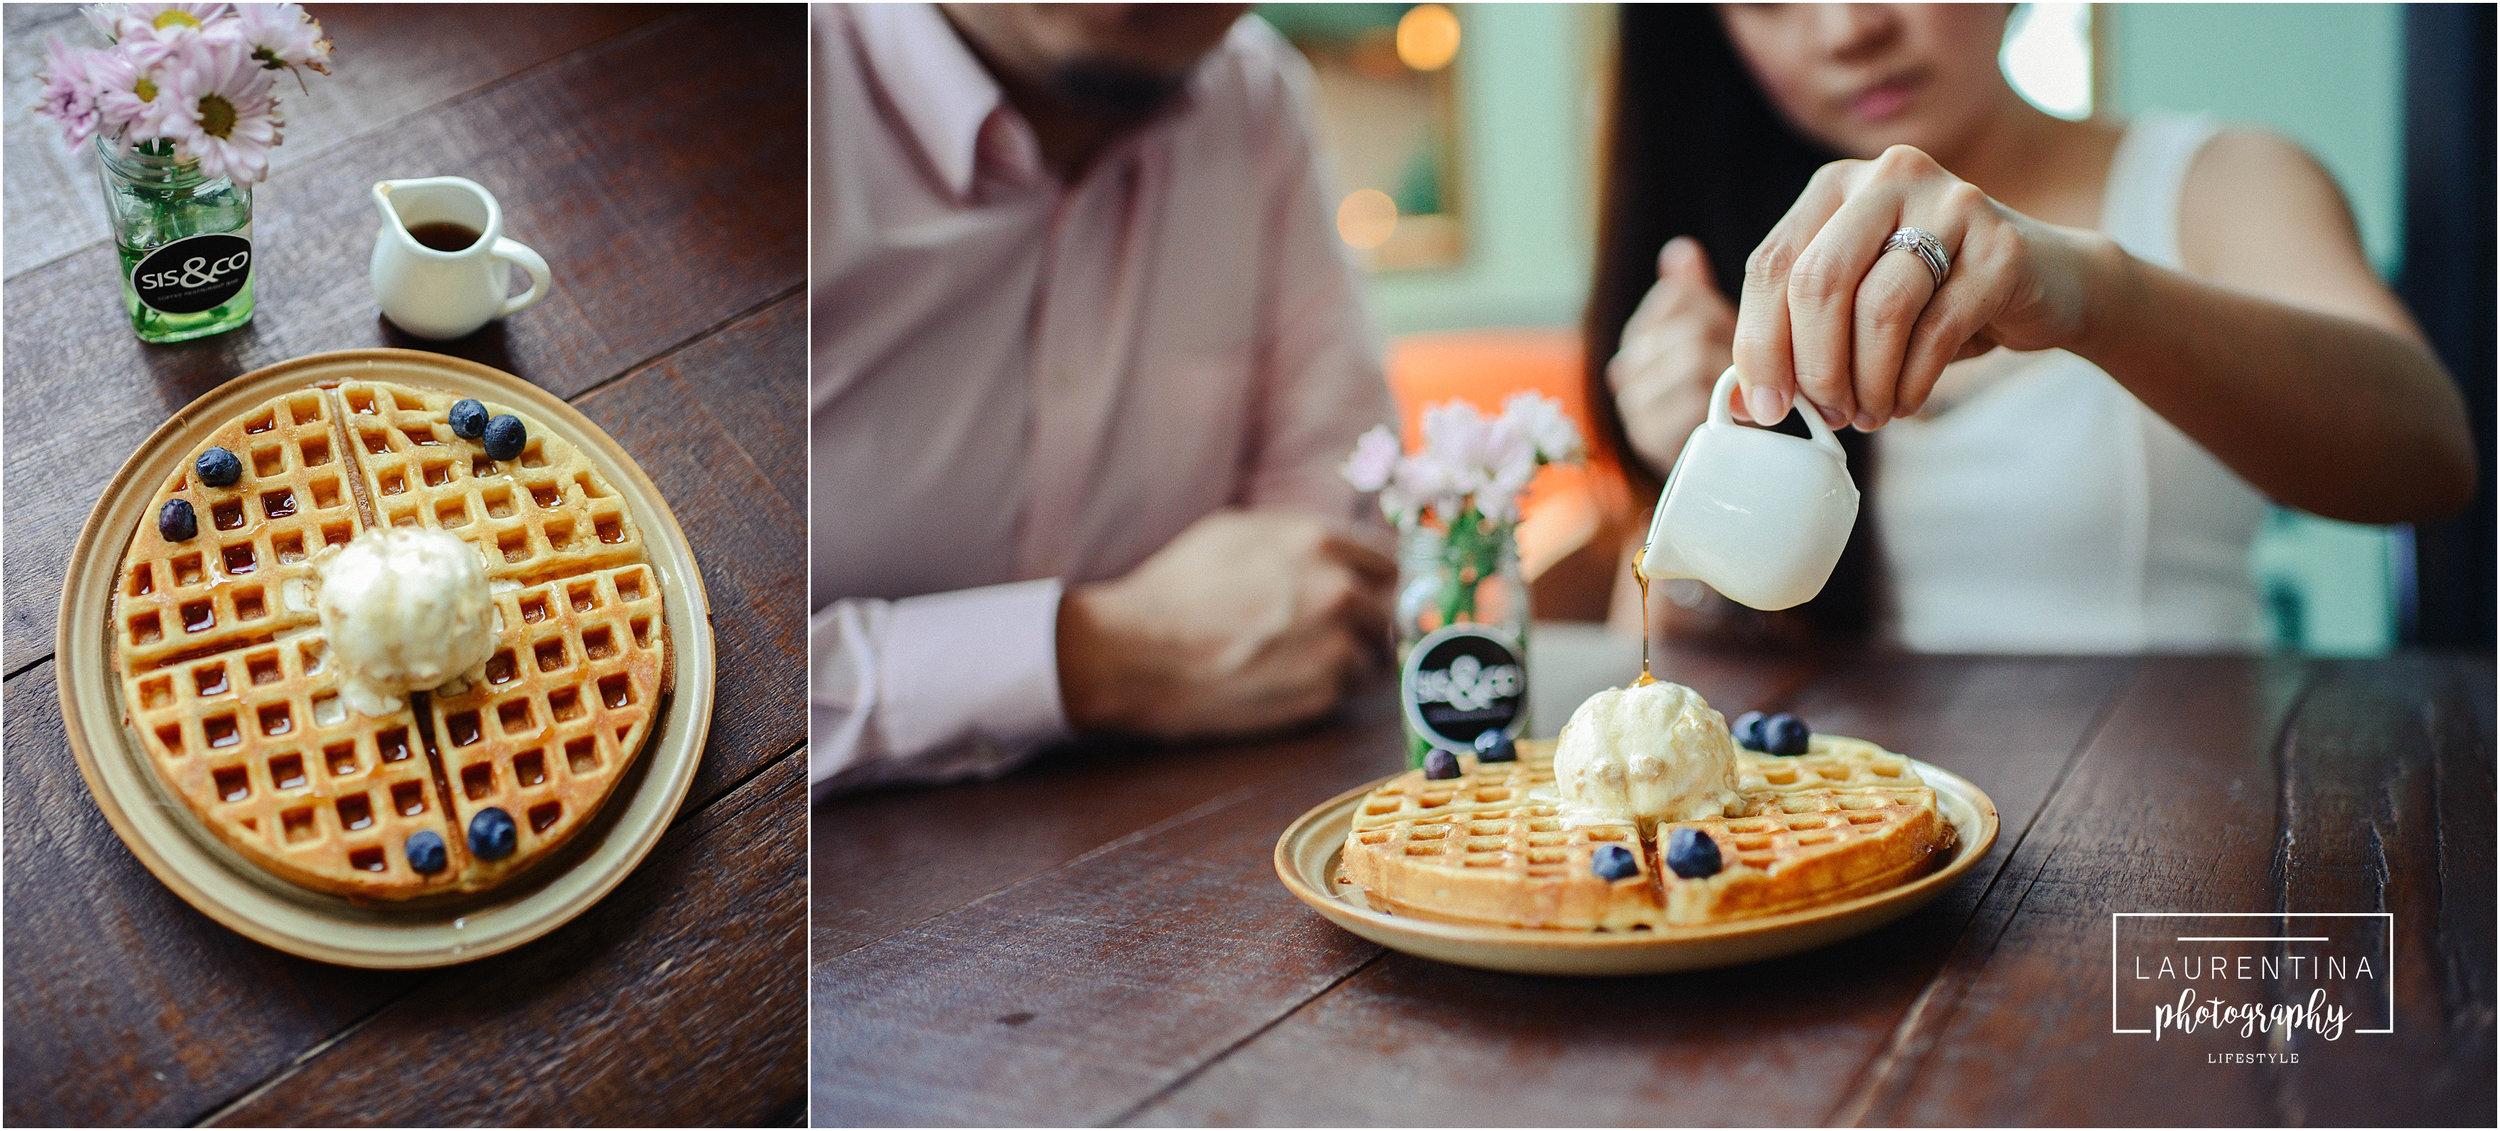 Waffles and Ice Cream Engagement Photography Malaysia